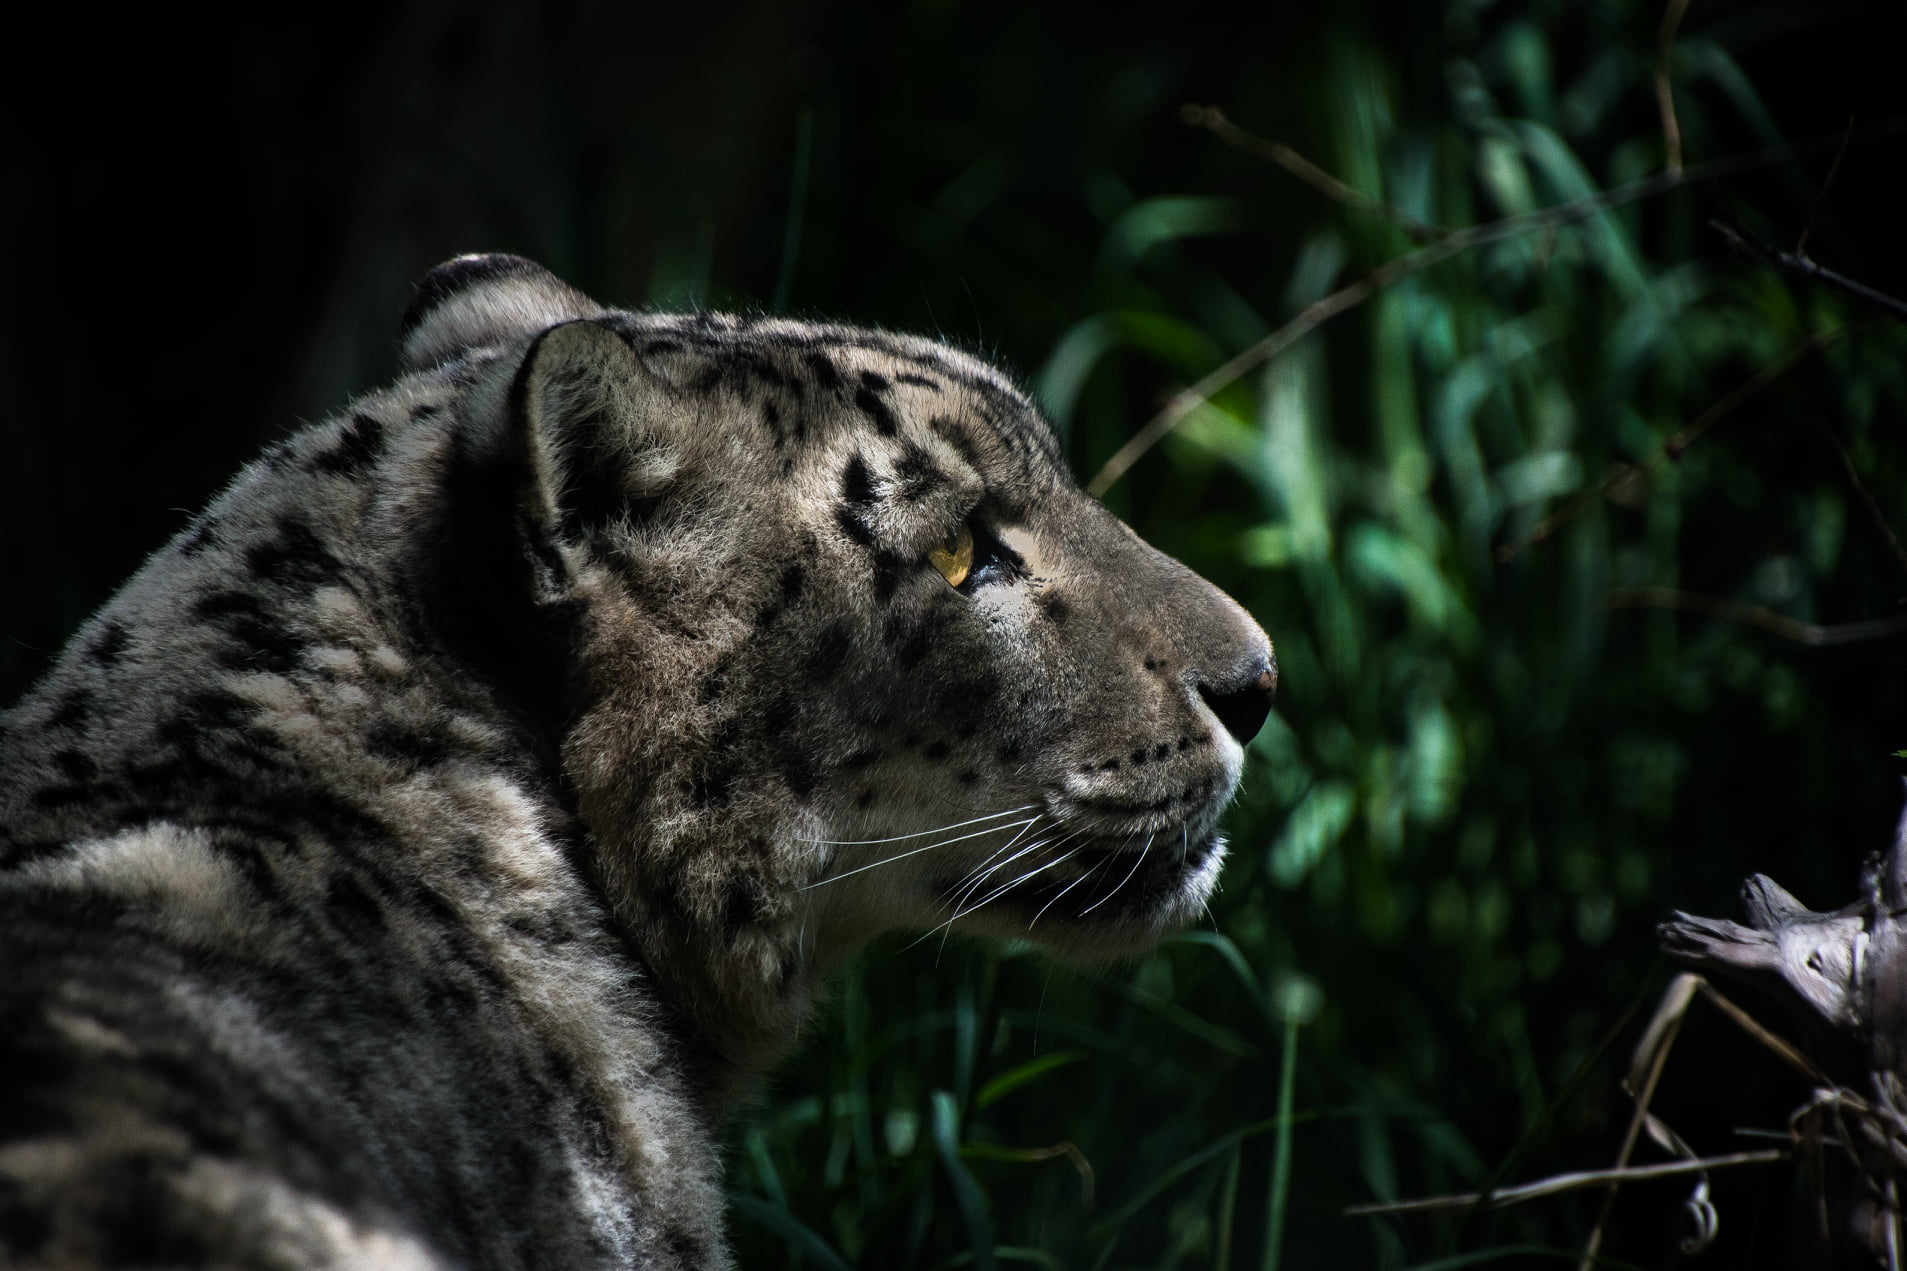 Nema the Snow Leopard